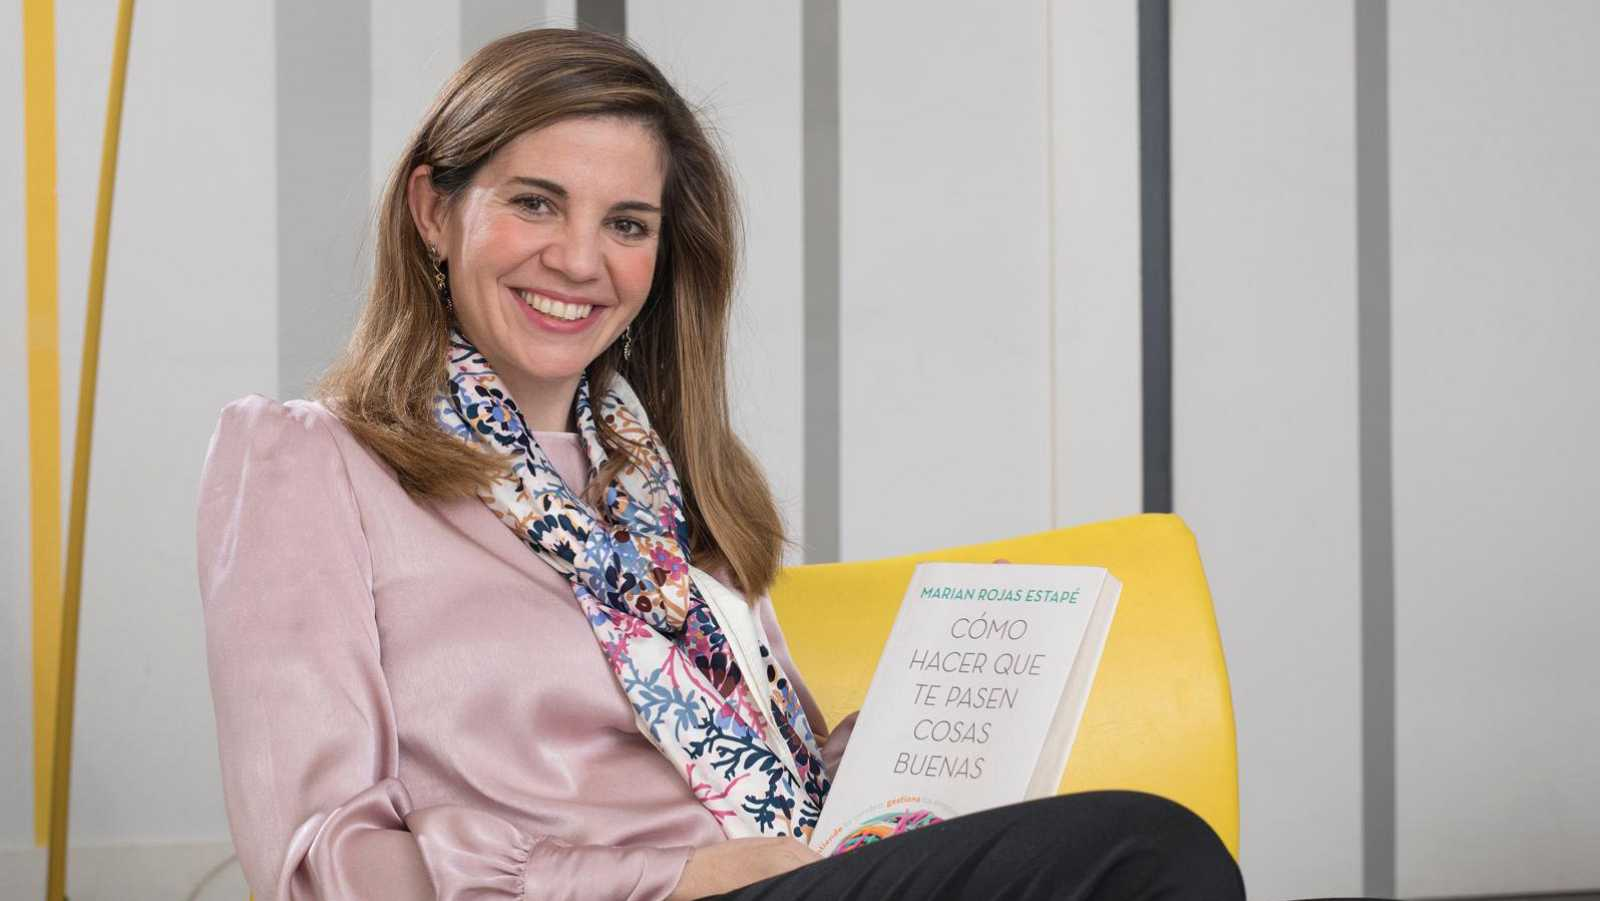 Marca España - Marian Rojas Estapé nos ayuda a combatir la fatiga pandémica - 13/11/20 - escuchar ahora